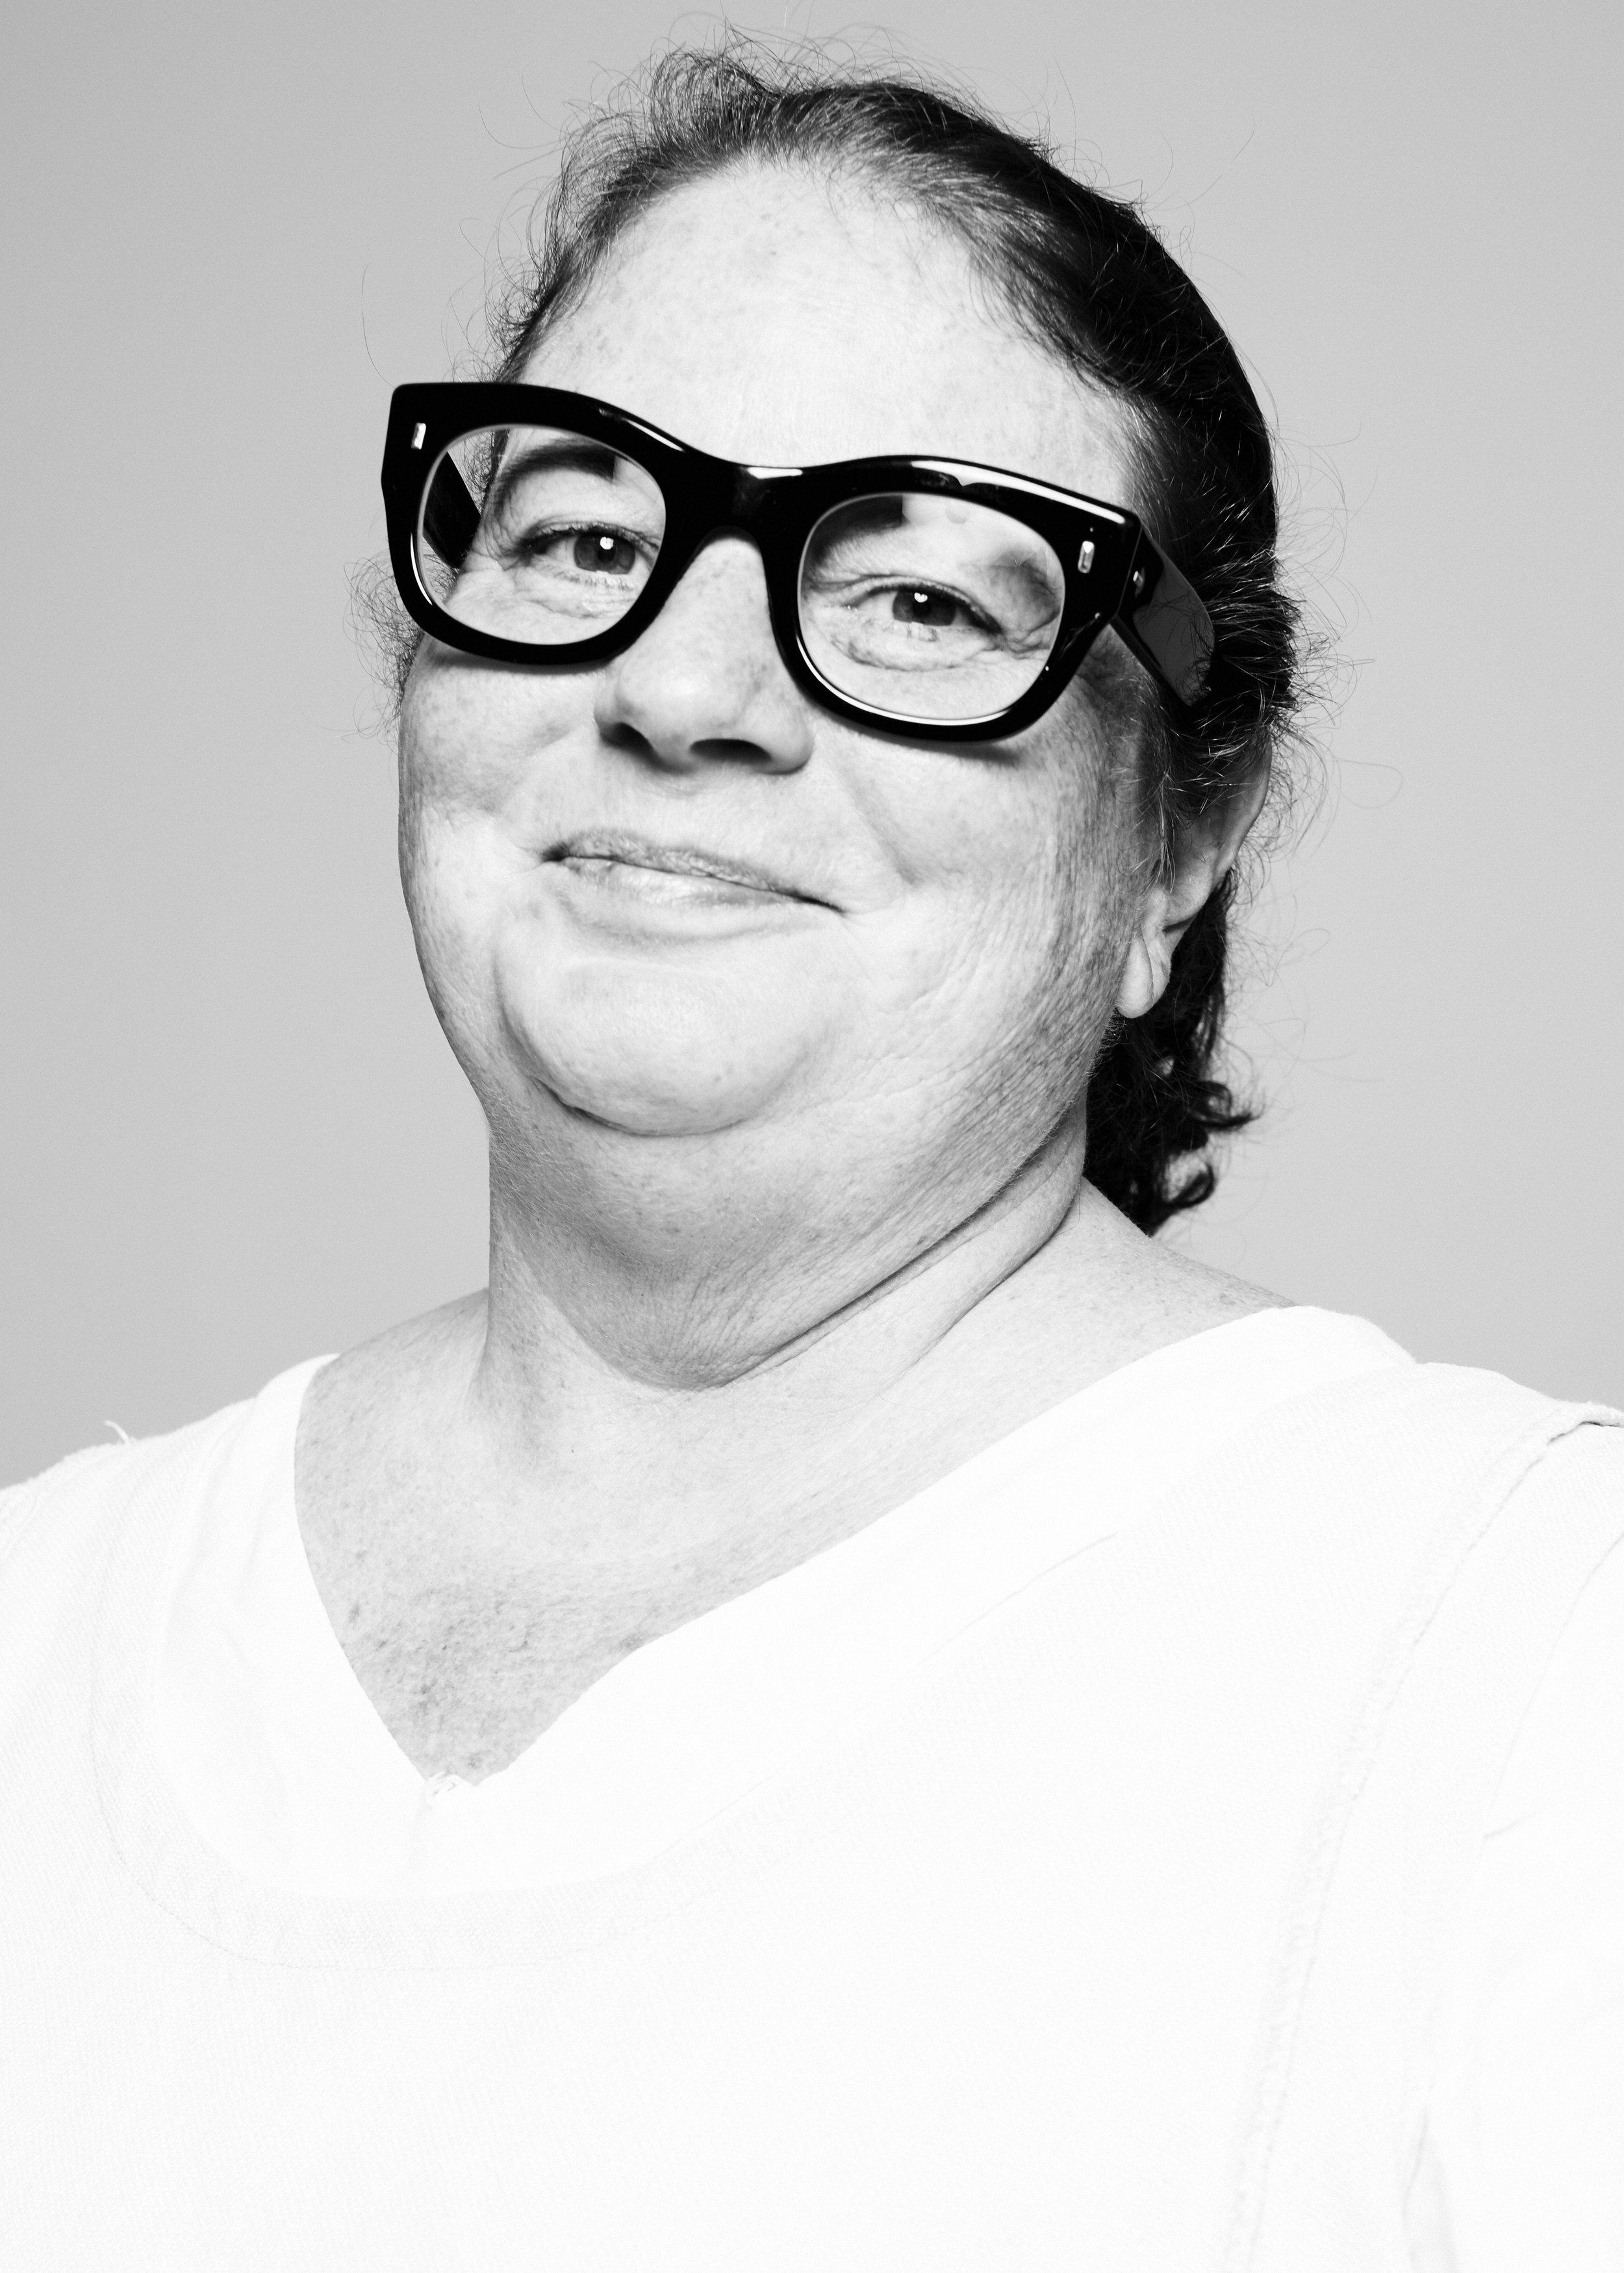 Chef Anne Quatrano (Atlanta, GA): Bacchanalia, Floataway Café, Star Provisions, Dub's Fish Camp